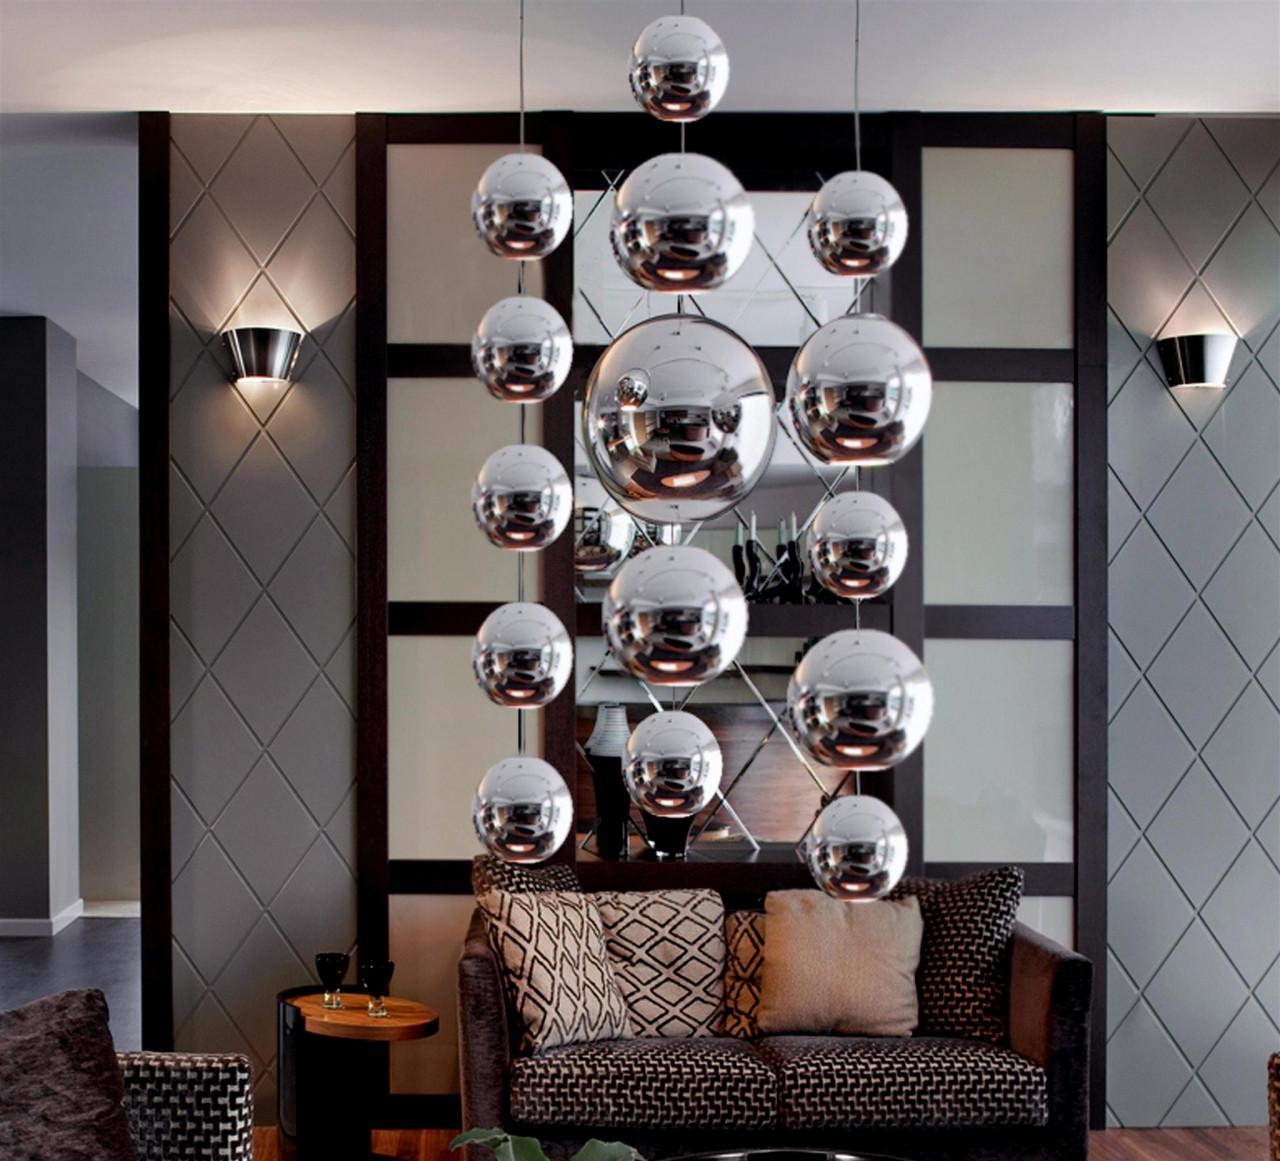 Metalowa kula 60 x 1000mm 74.004.06  hanging decoballs - chrome